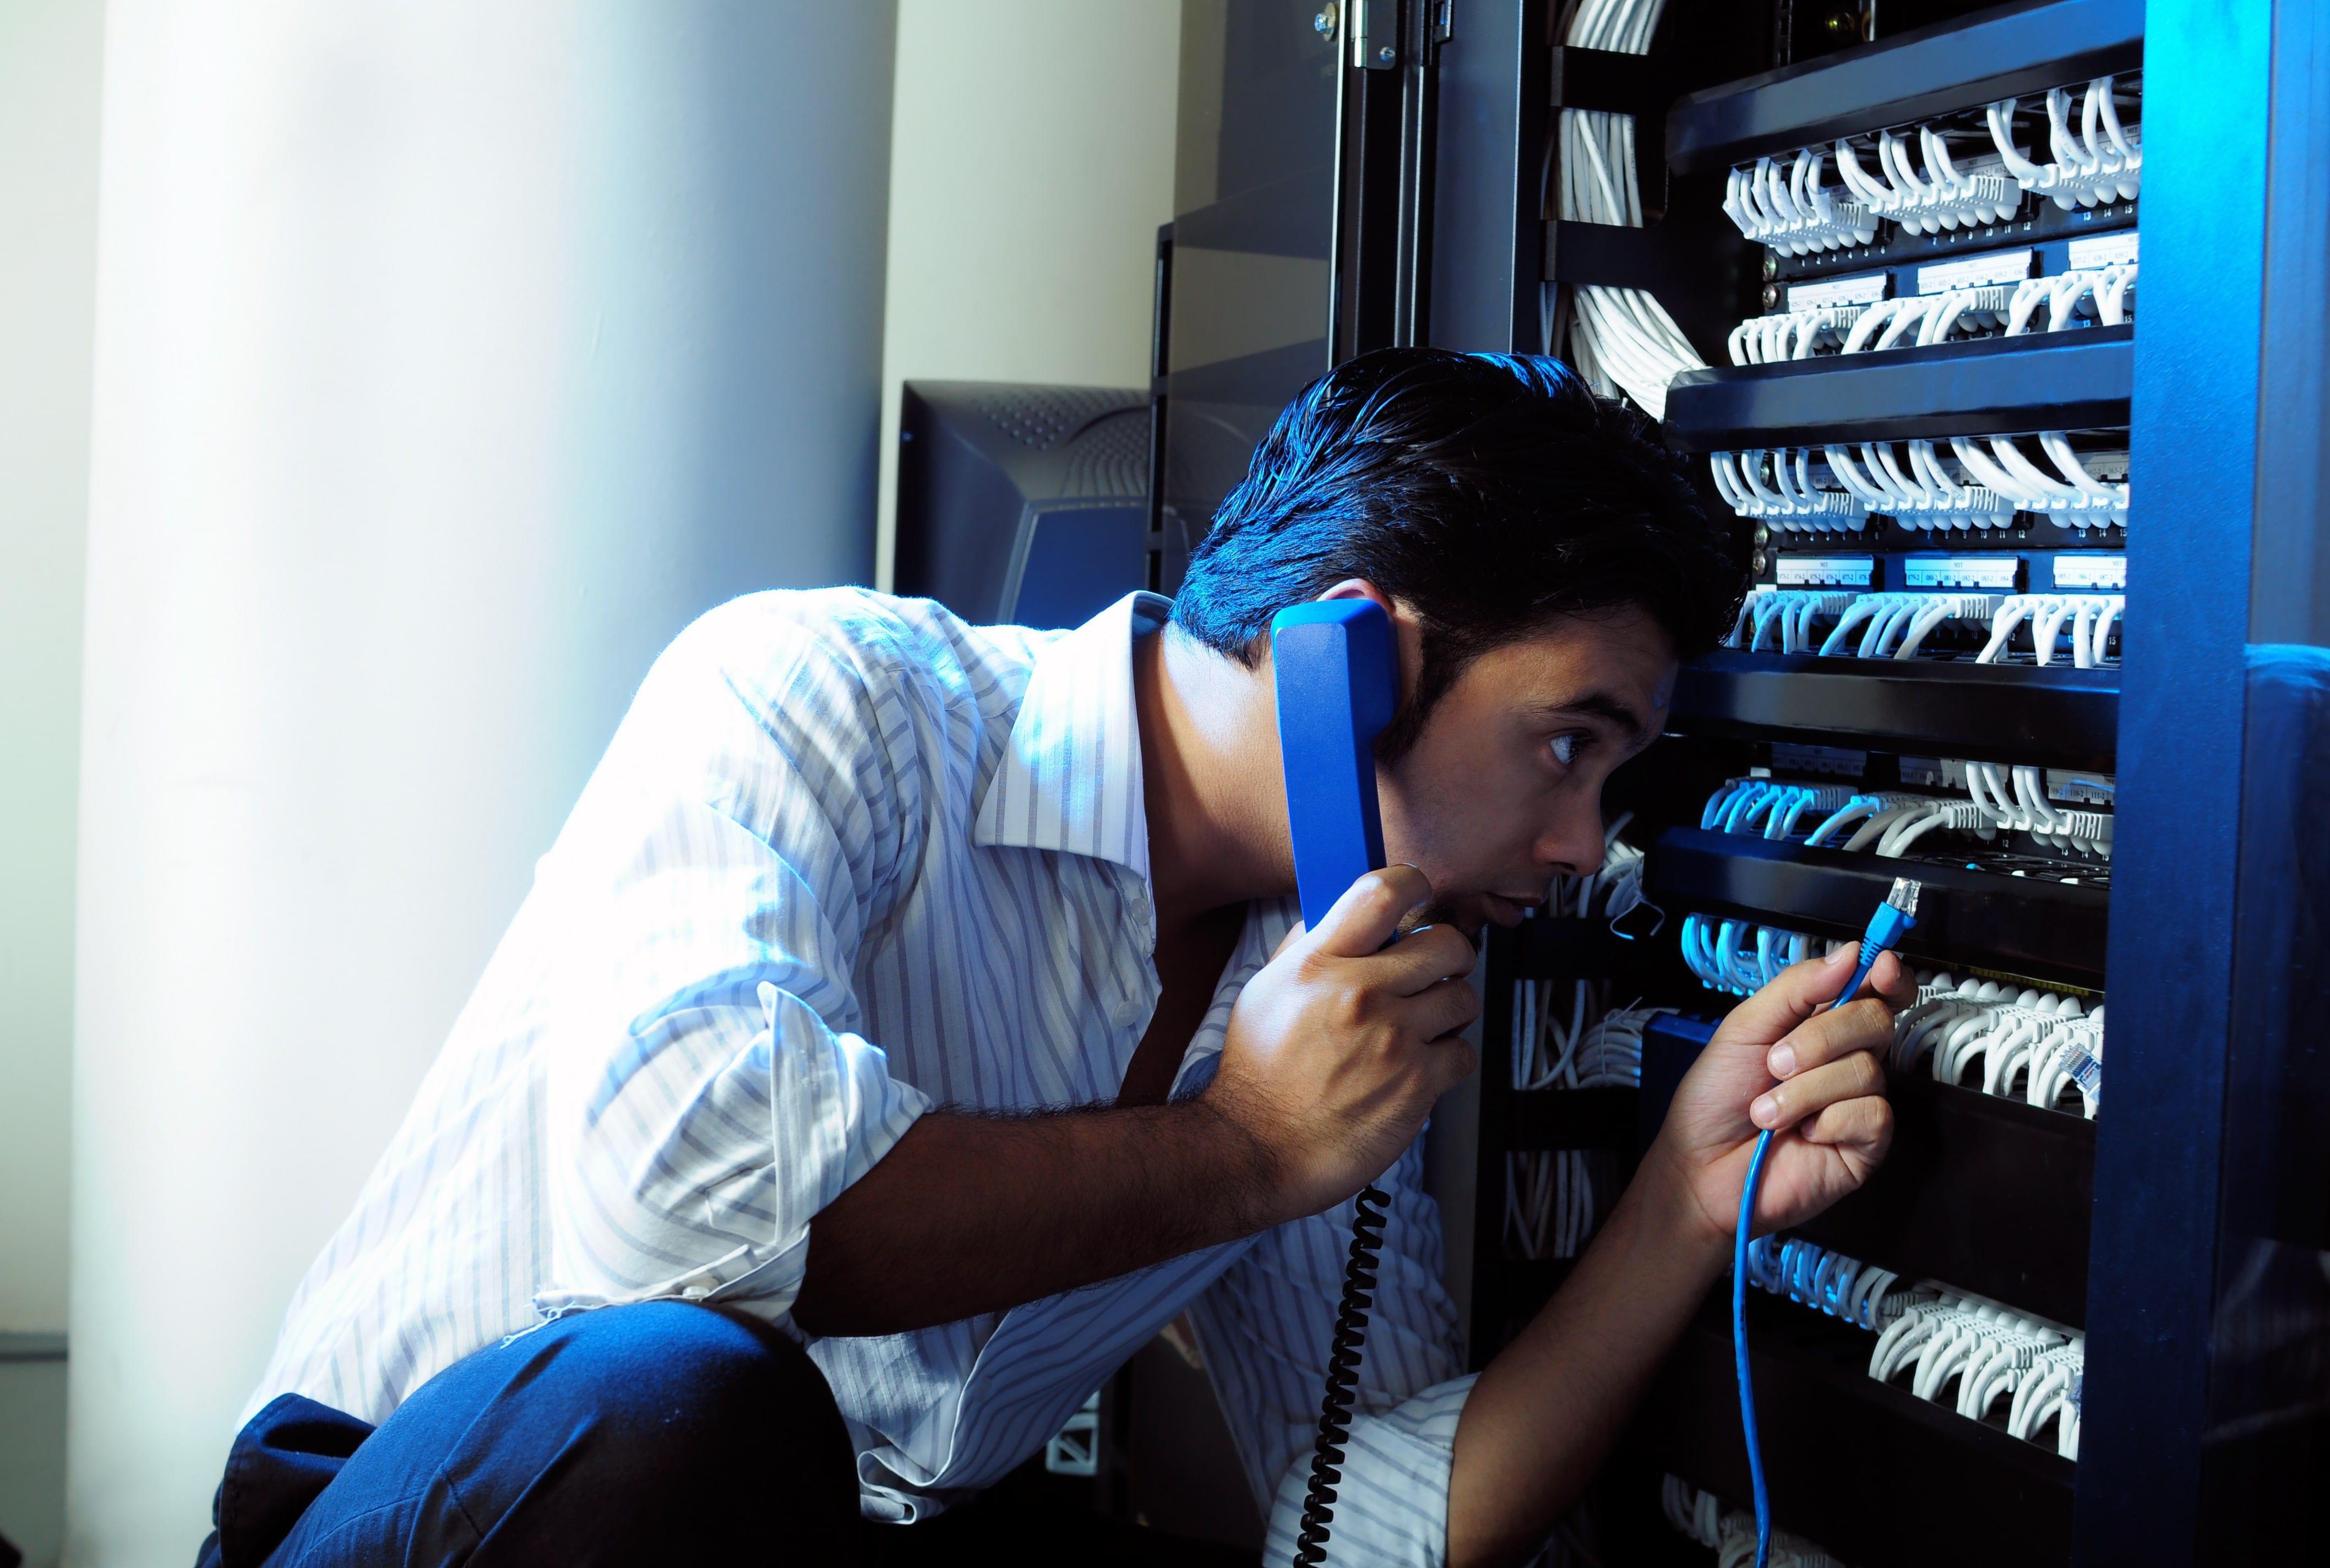 QualTel Communications professional subcontracting services